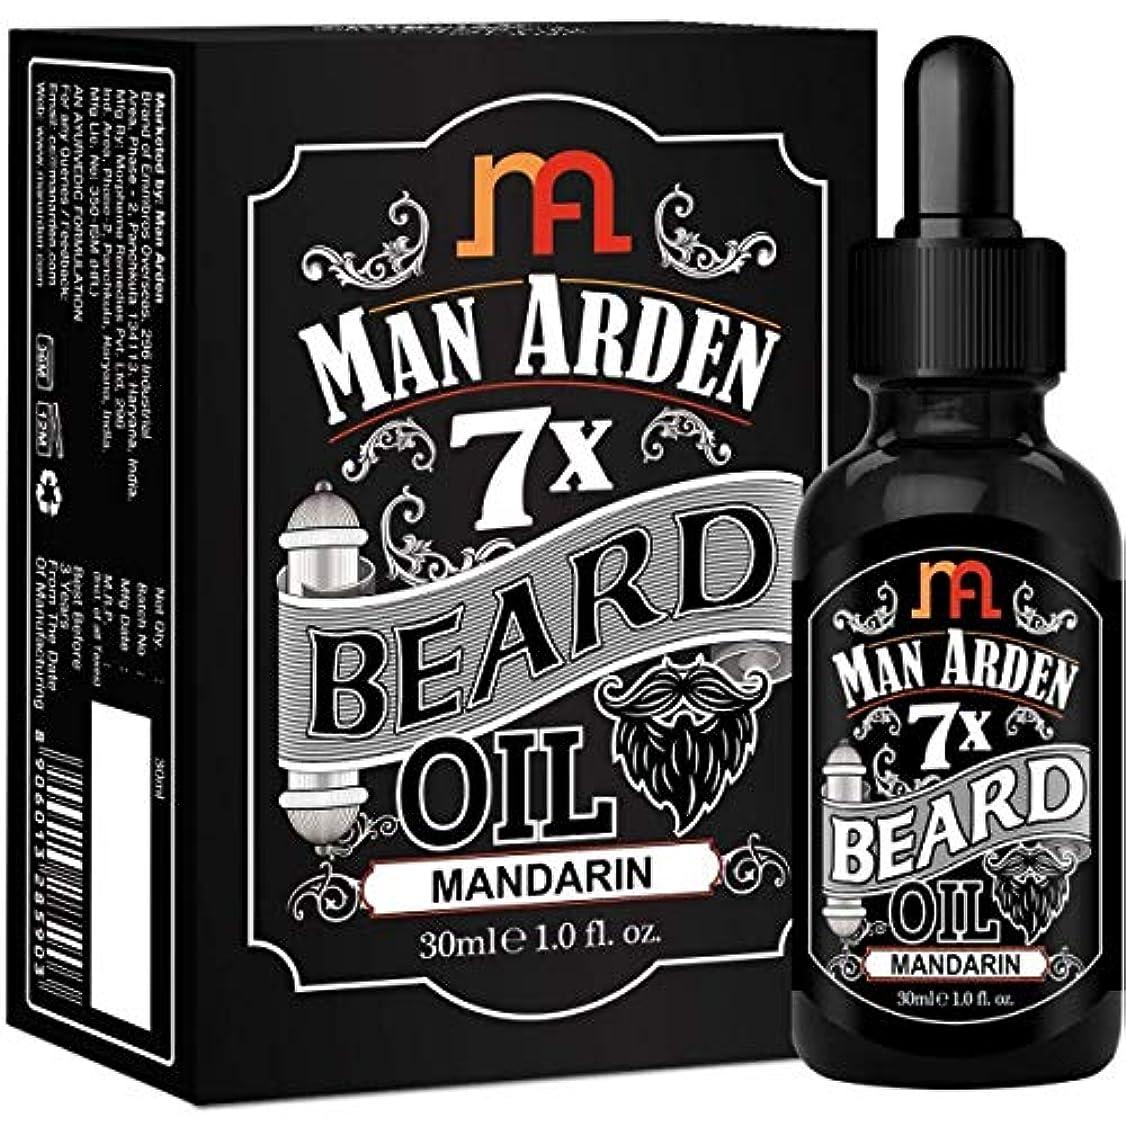 放映大声で認証Man Arden 7X Beard Oil 30ml (Mandarin) - 7 Premium Oils Blend For Beard Growth & Nourishment